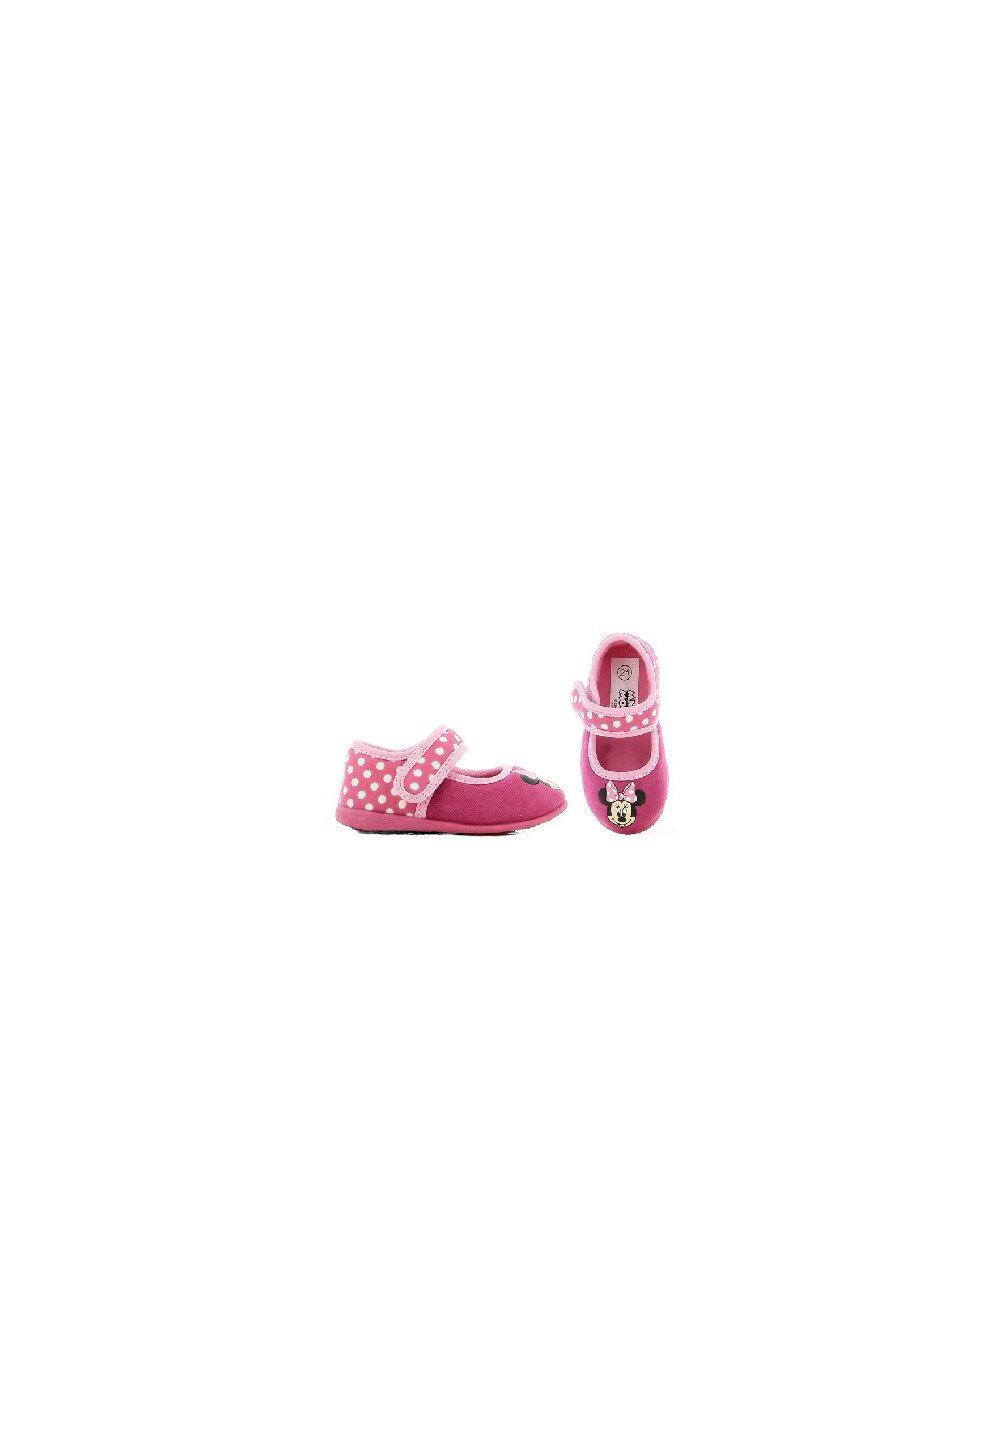 Incaltaminte interior, Minnie Mouse cu fundita roz cu buline imagine